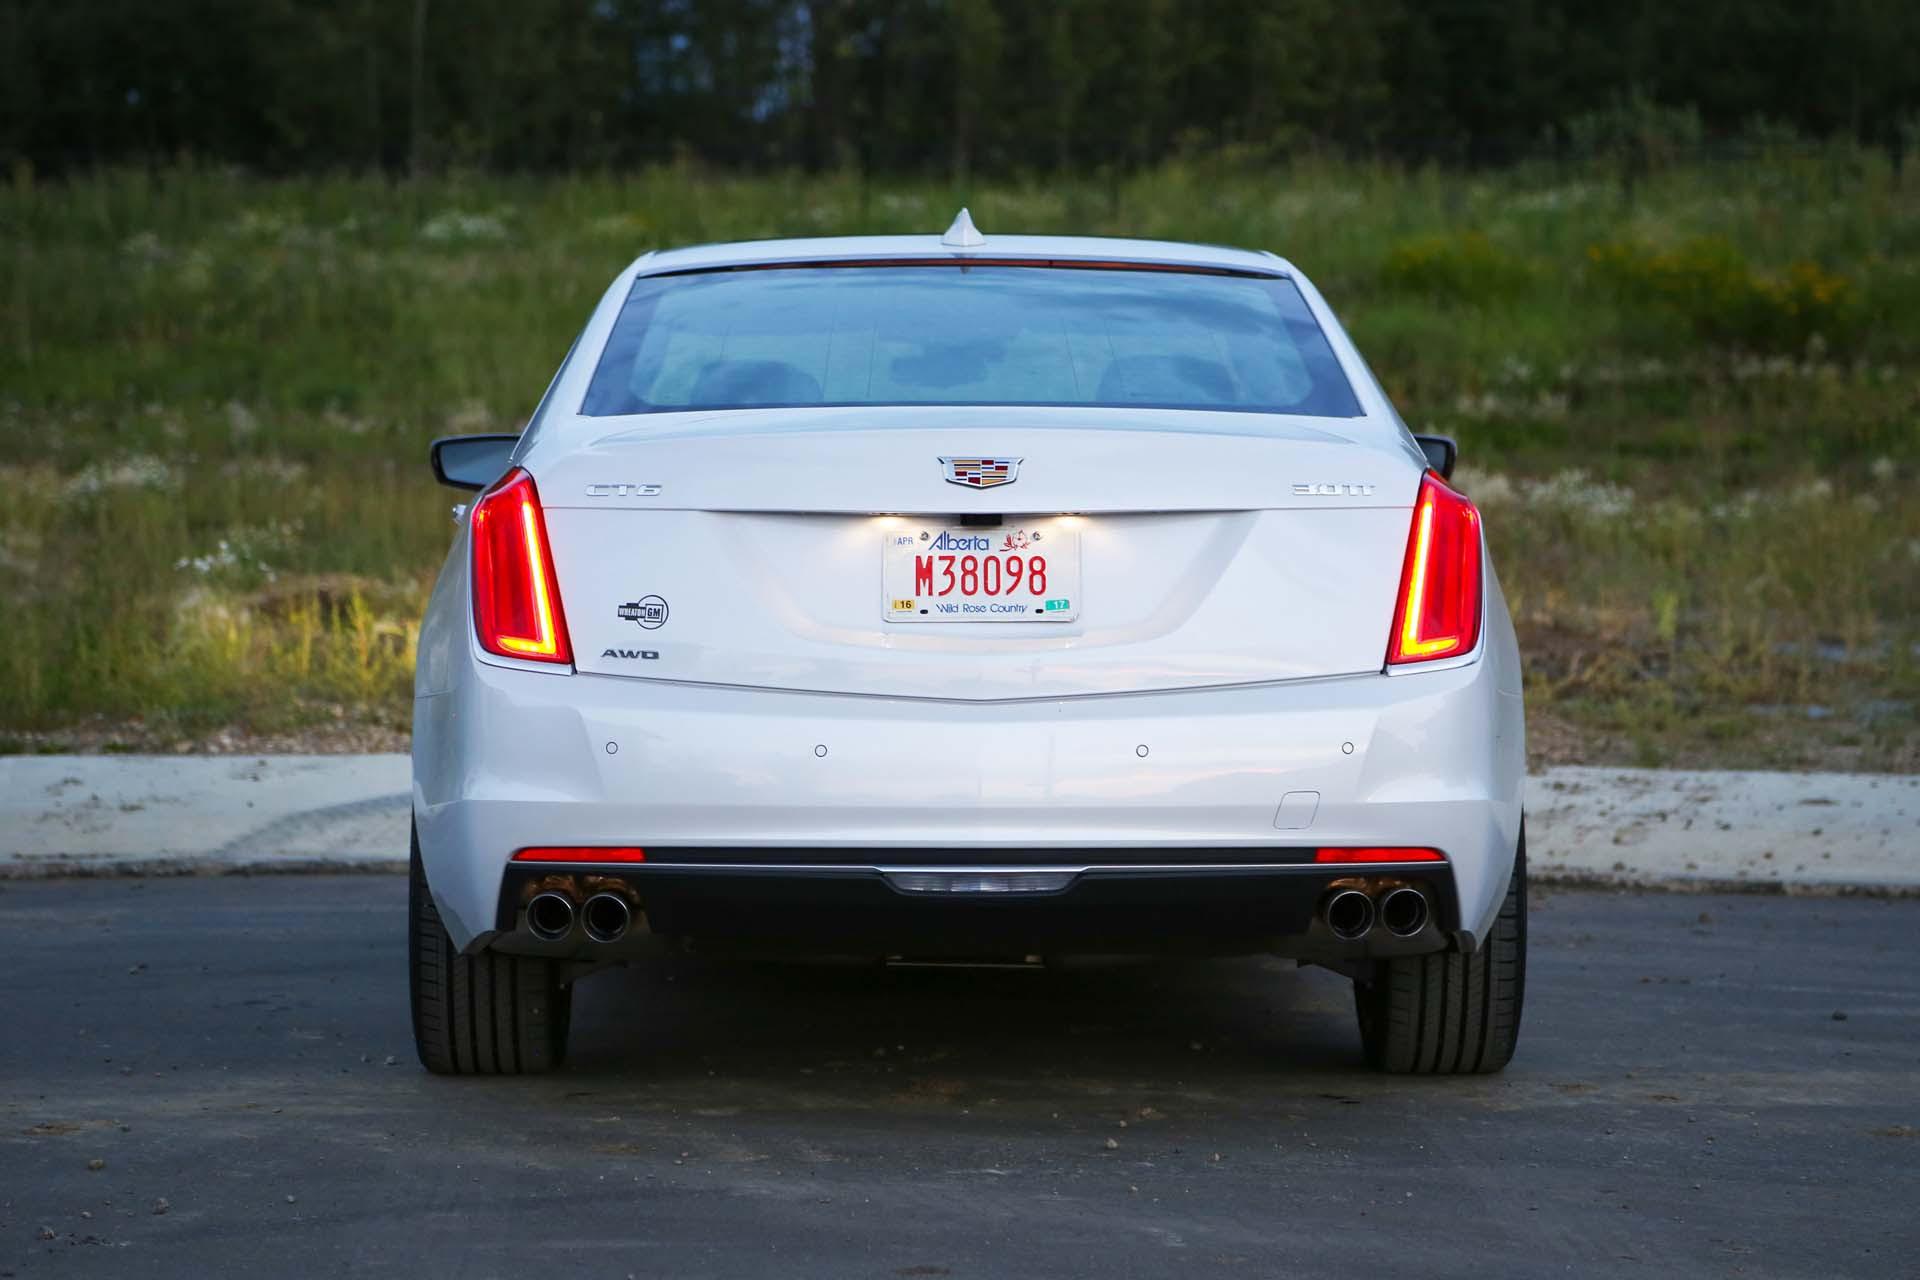 2016 Cadillac CT6 Twin Turbo Premium Luxury - Autos.ca